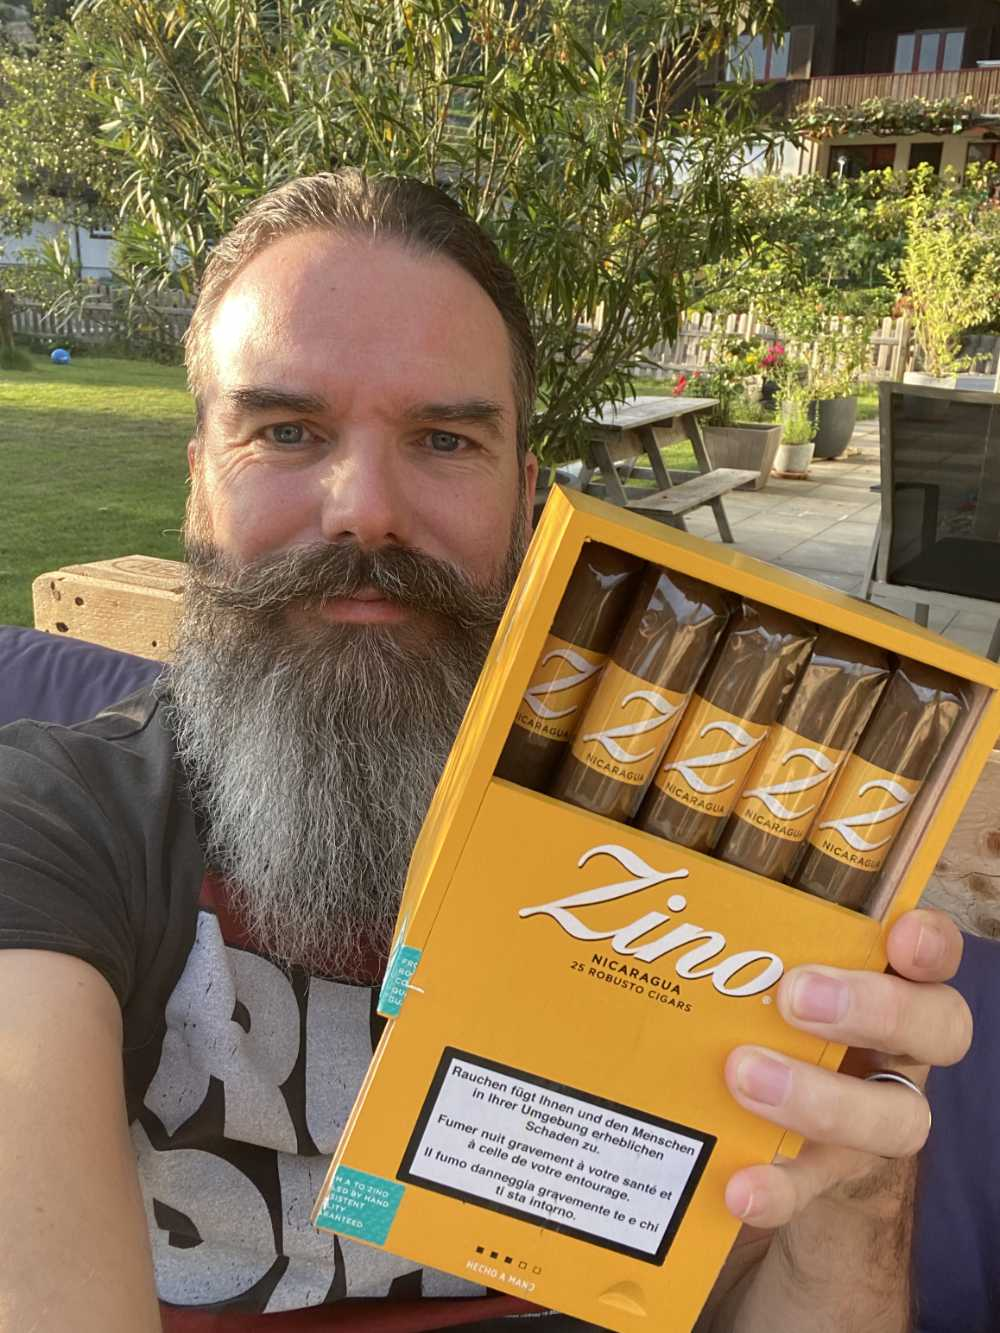 Oliver gewann 25er Kiste Zino Nicaragua Robusto